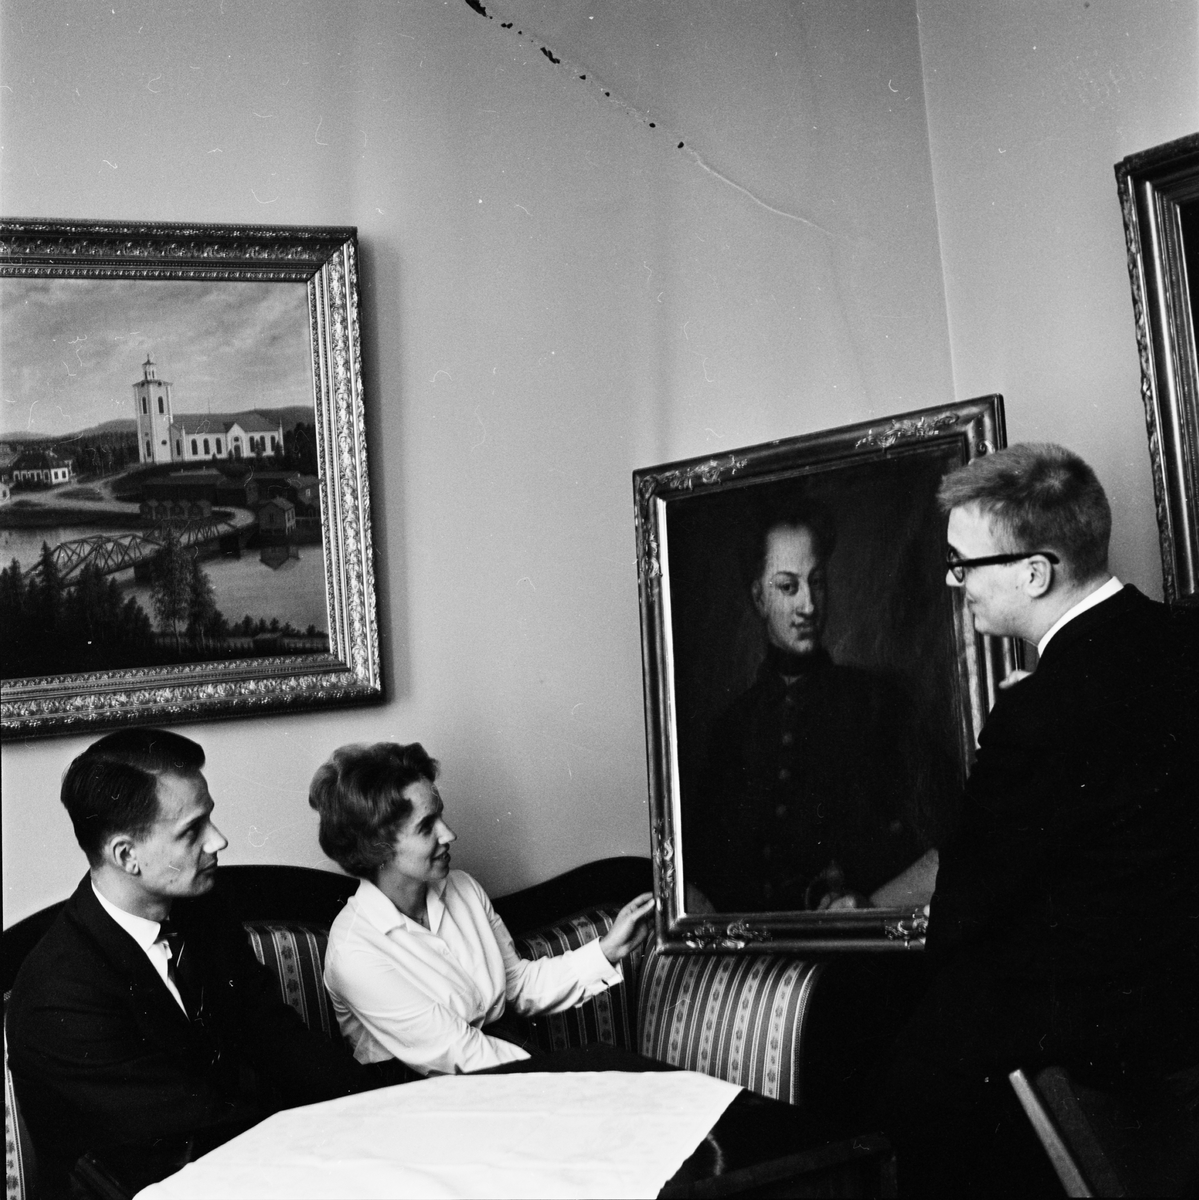 Gästrike-Hälsinge nation, Uppsala april 1963